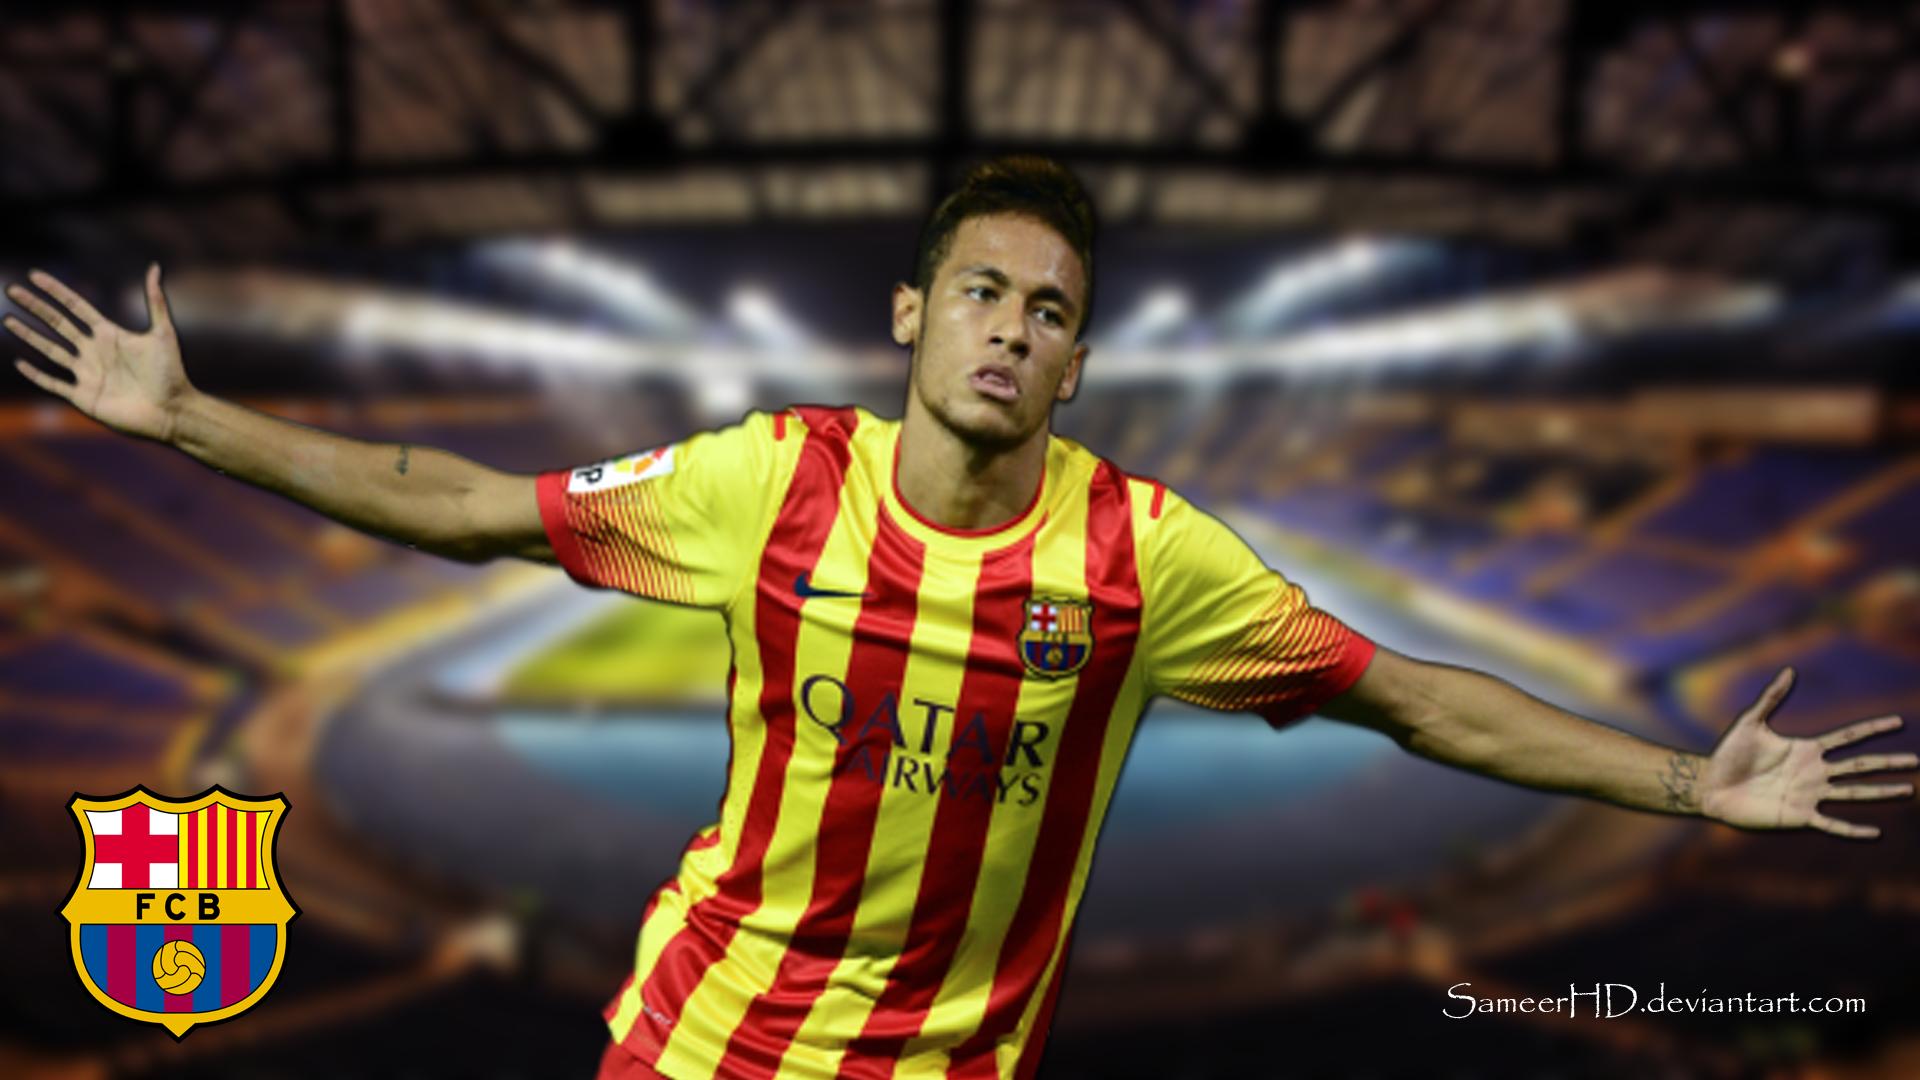 Fc Barcelona Neymar Jr Wallpaper By Sameerhd On Deviantart